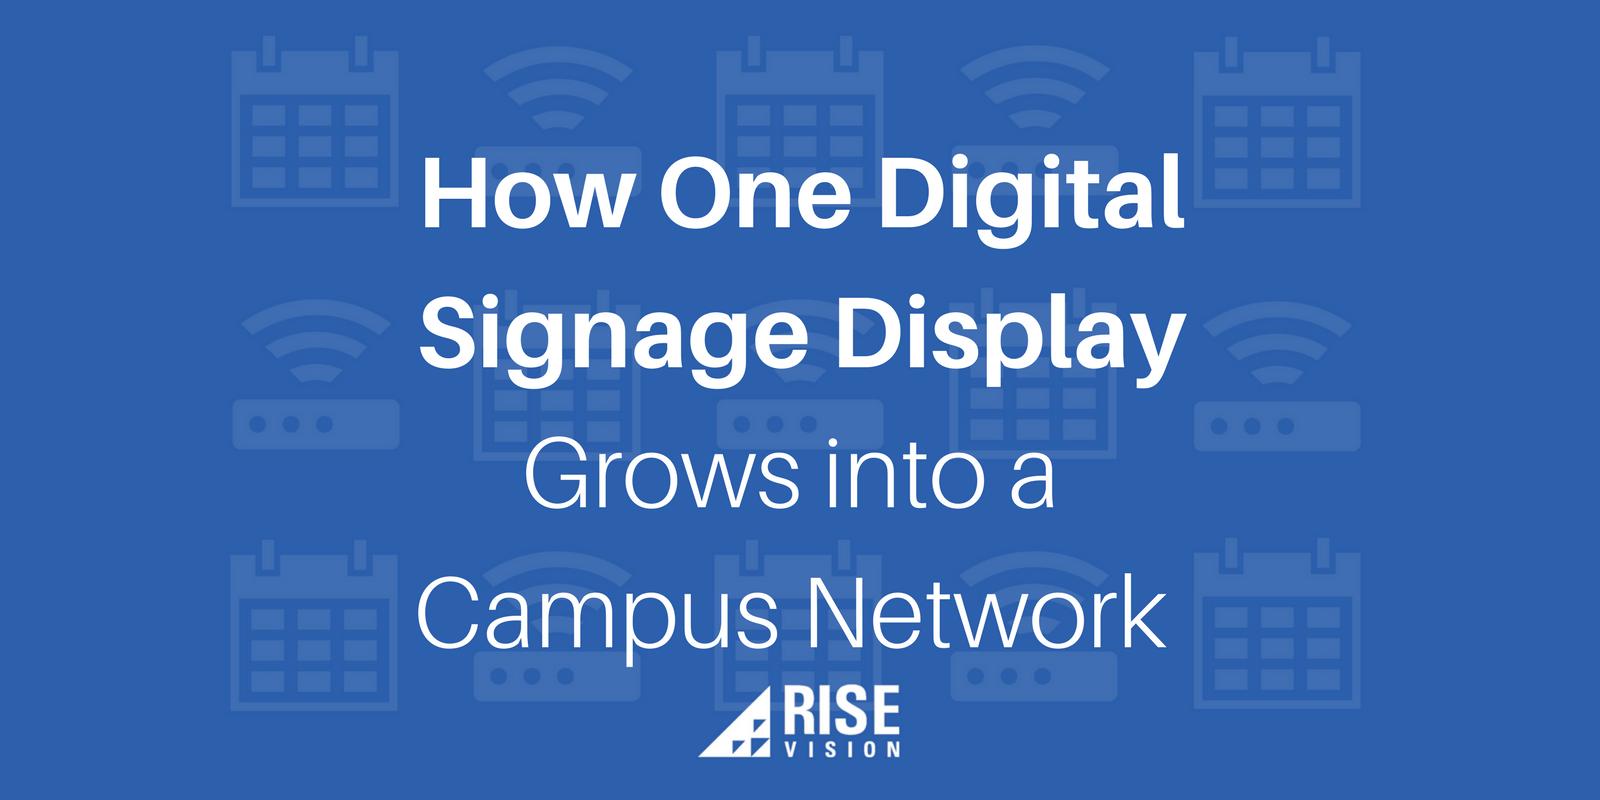 Rise Vision Digital Signage Campus College University Network.png